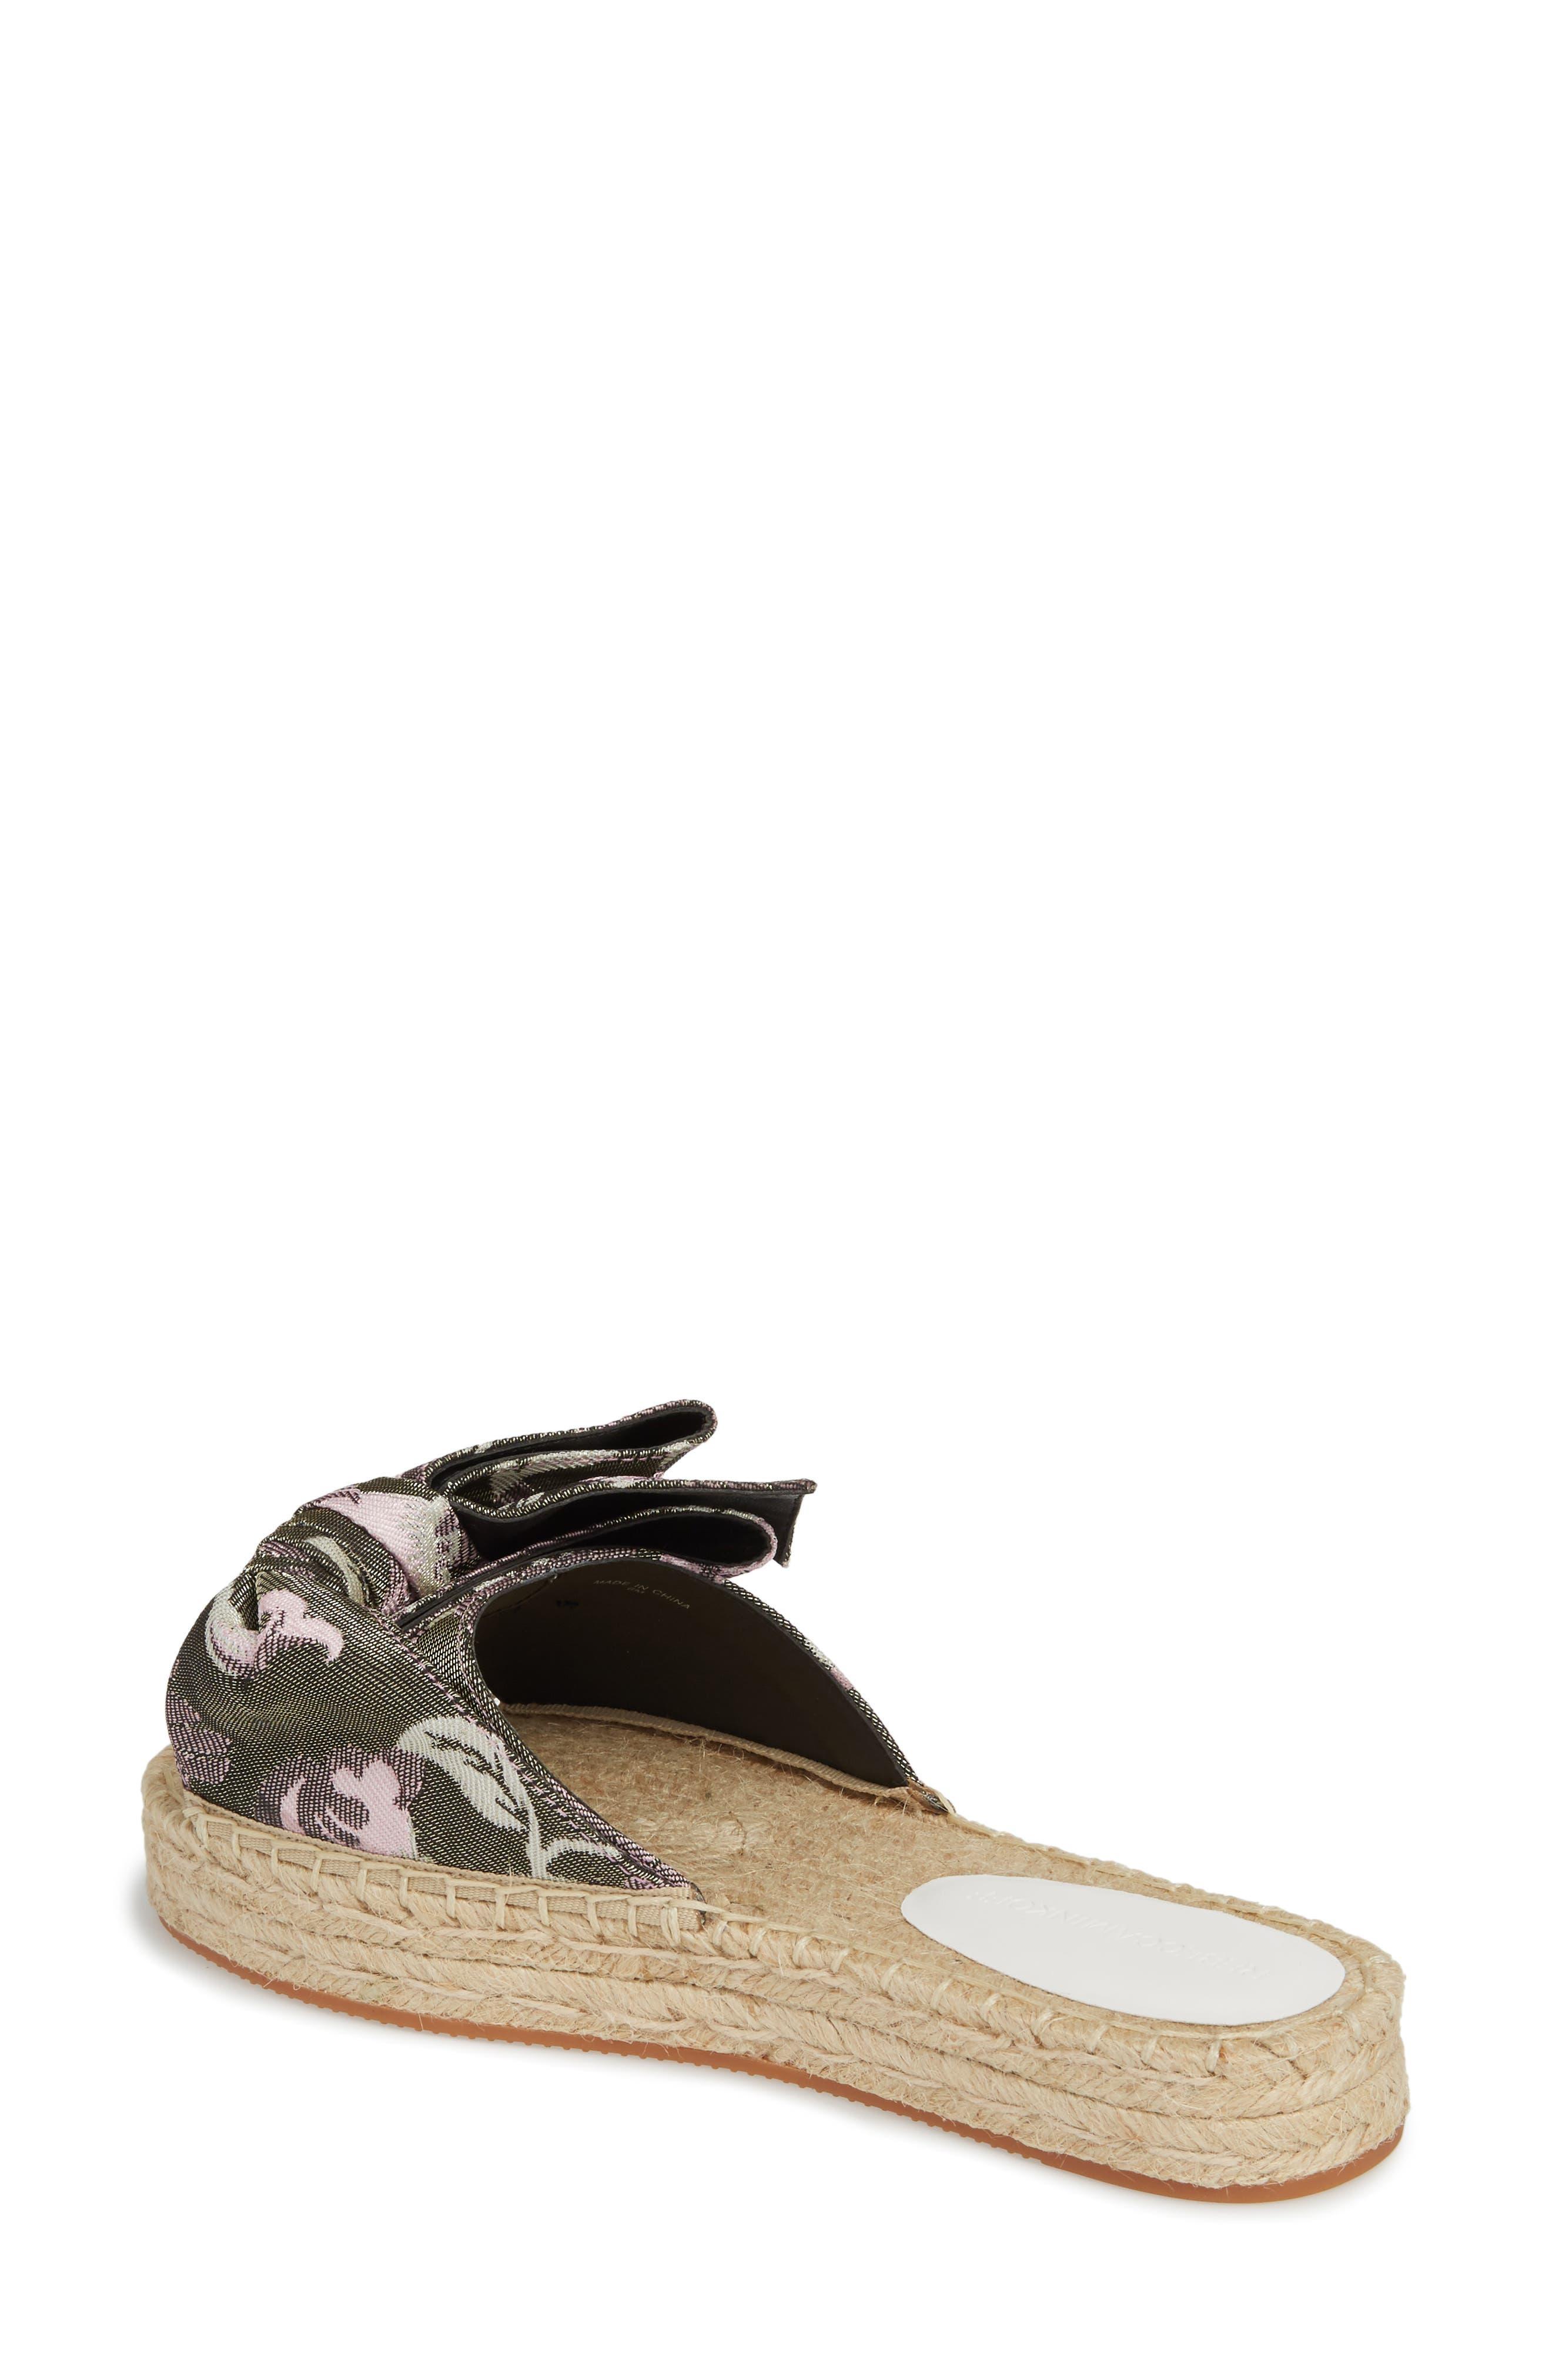 Giana Bow Slide Sandal,                             Alternate thumbnail 2, color,                             GREEN MULTI JACQUARD